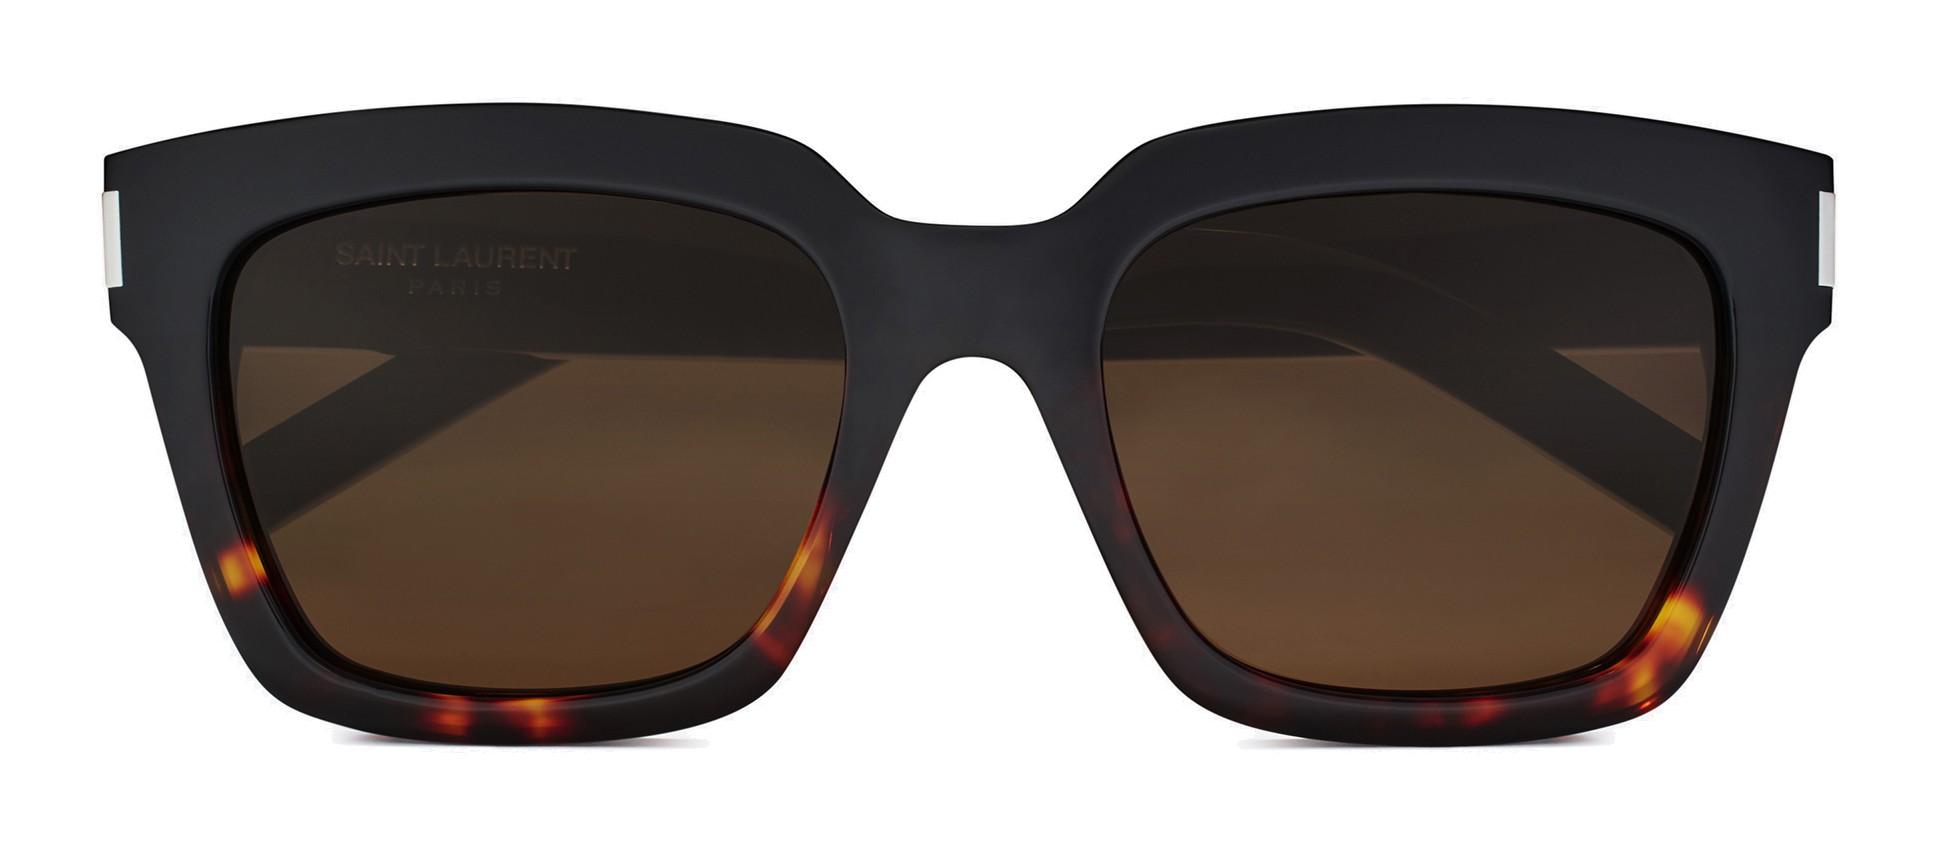 707e40d44ec Yves Saint Laurent - Bold SL1 Sunglasses with Square Thick Frames and Nylon  Lenses Brown and Havana - Saint Laurent Eyewear - Avvenice